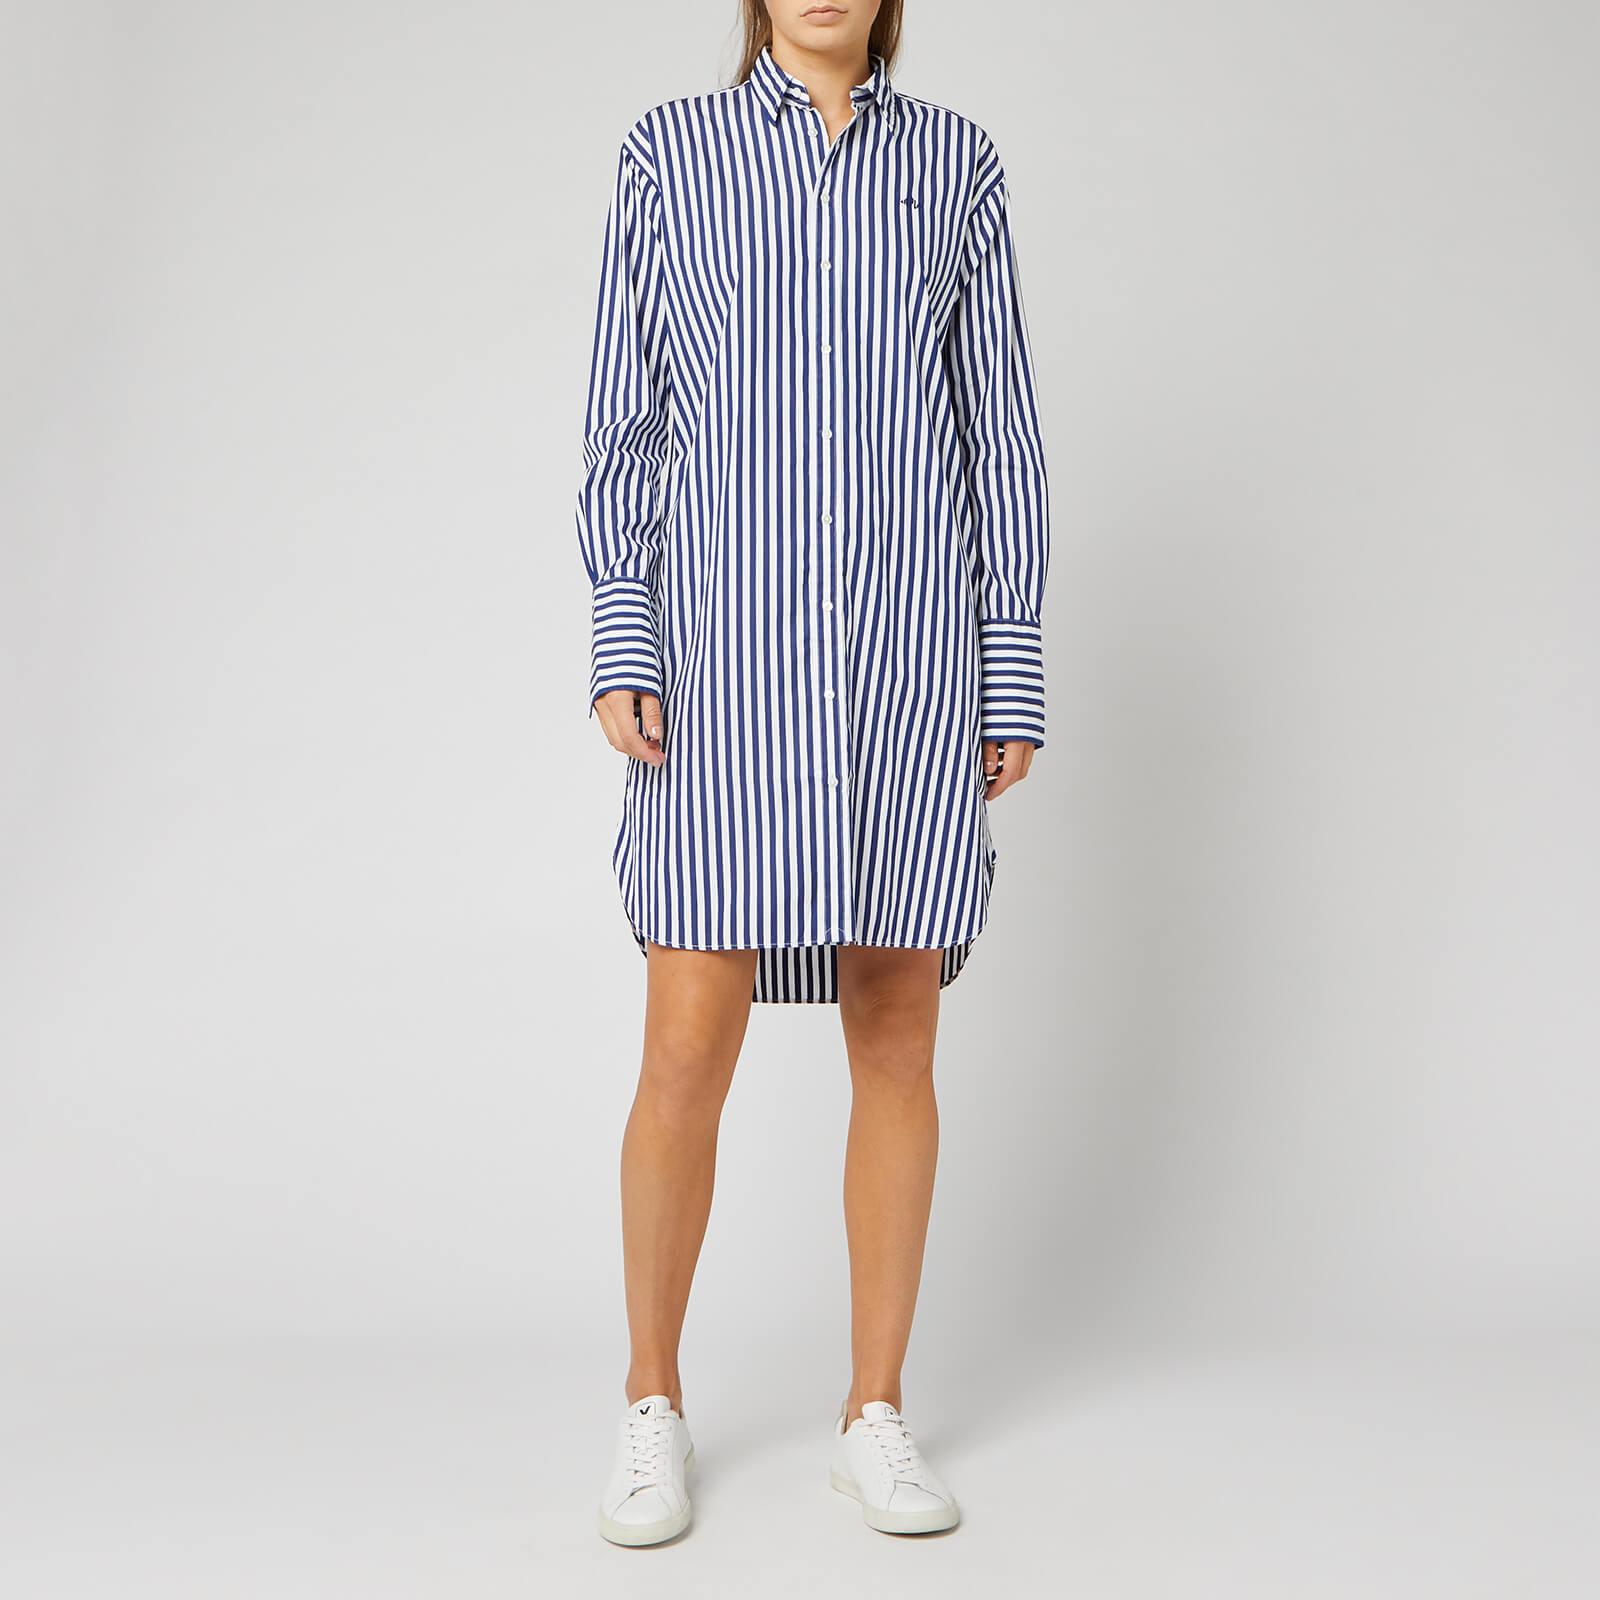 Sleeve Whitefall Navy Lauren Long Royal 204a Casual Polo Dress Ralph Women's S35LAq4cRj